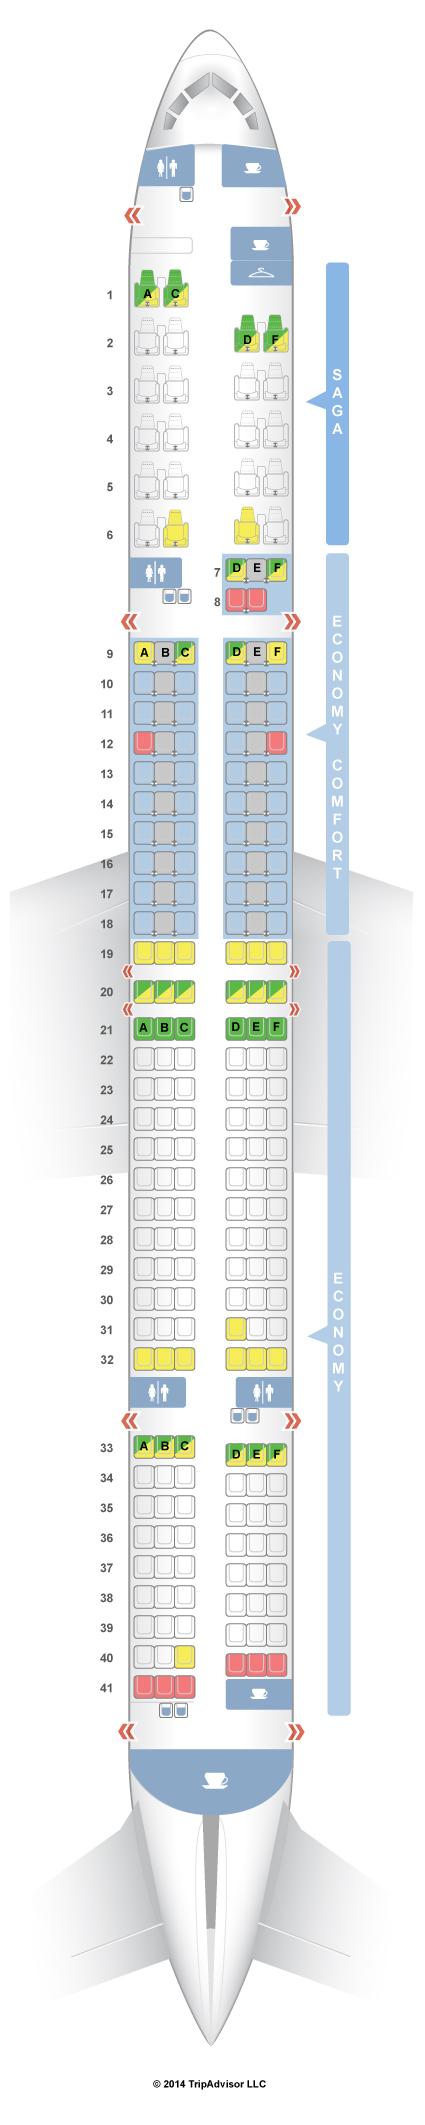 Icelandair Seating